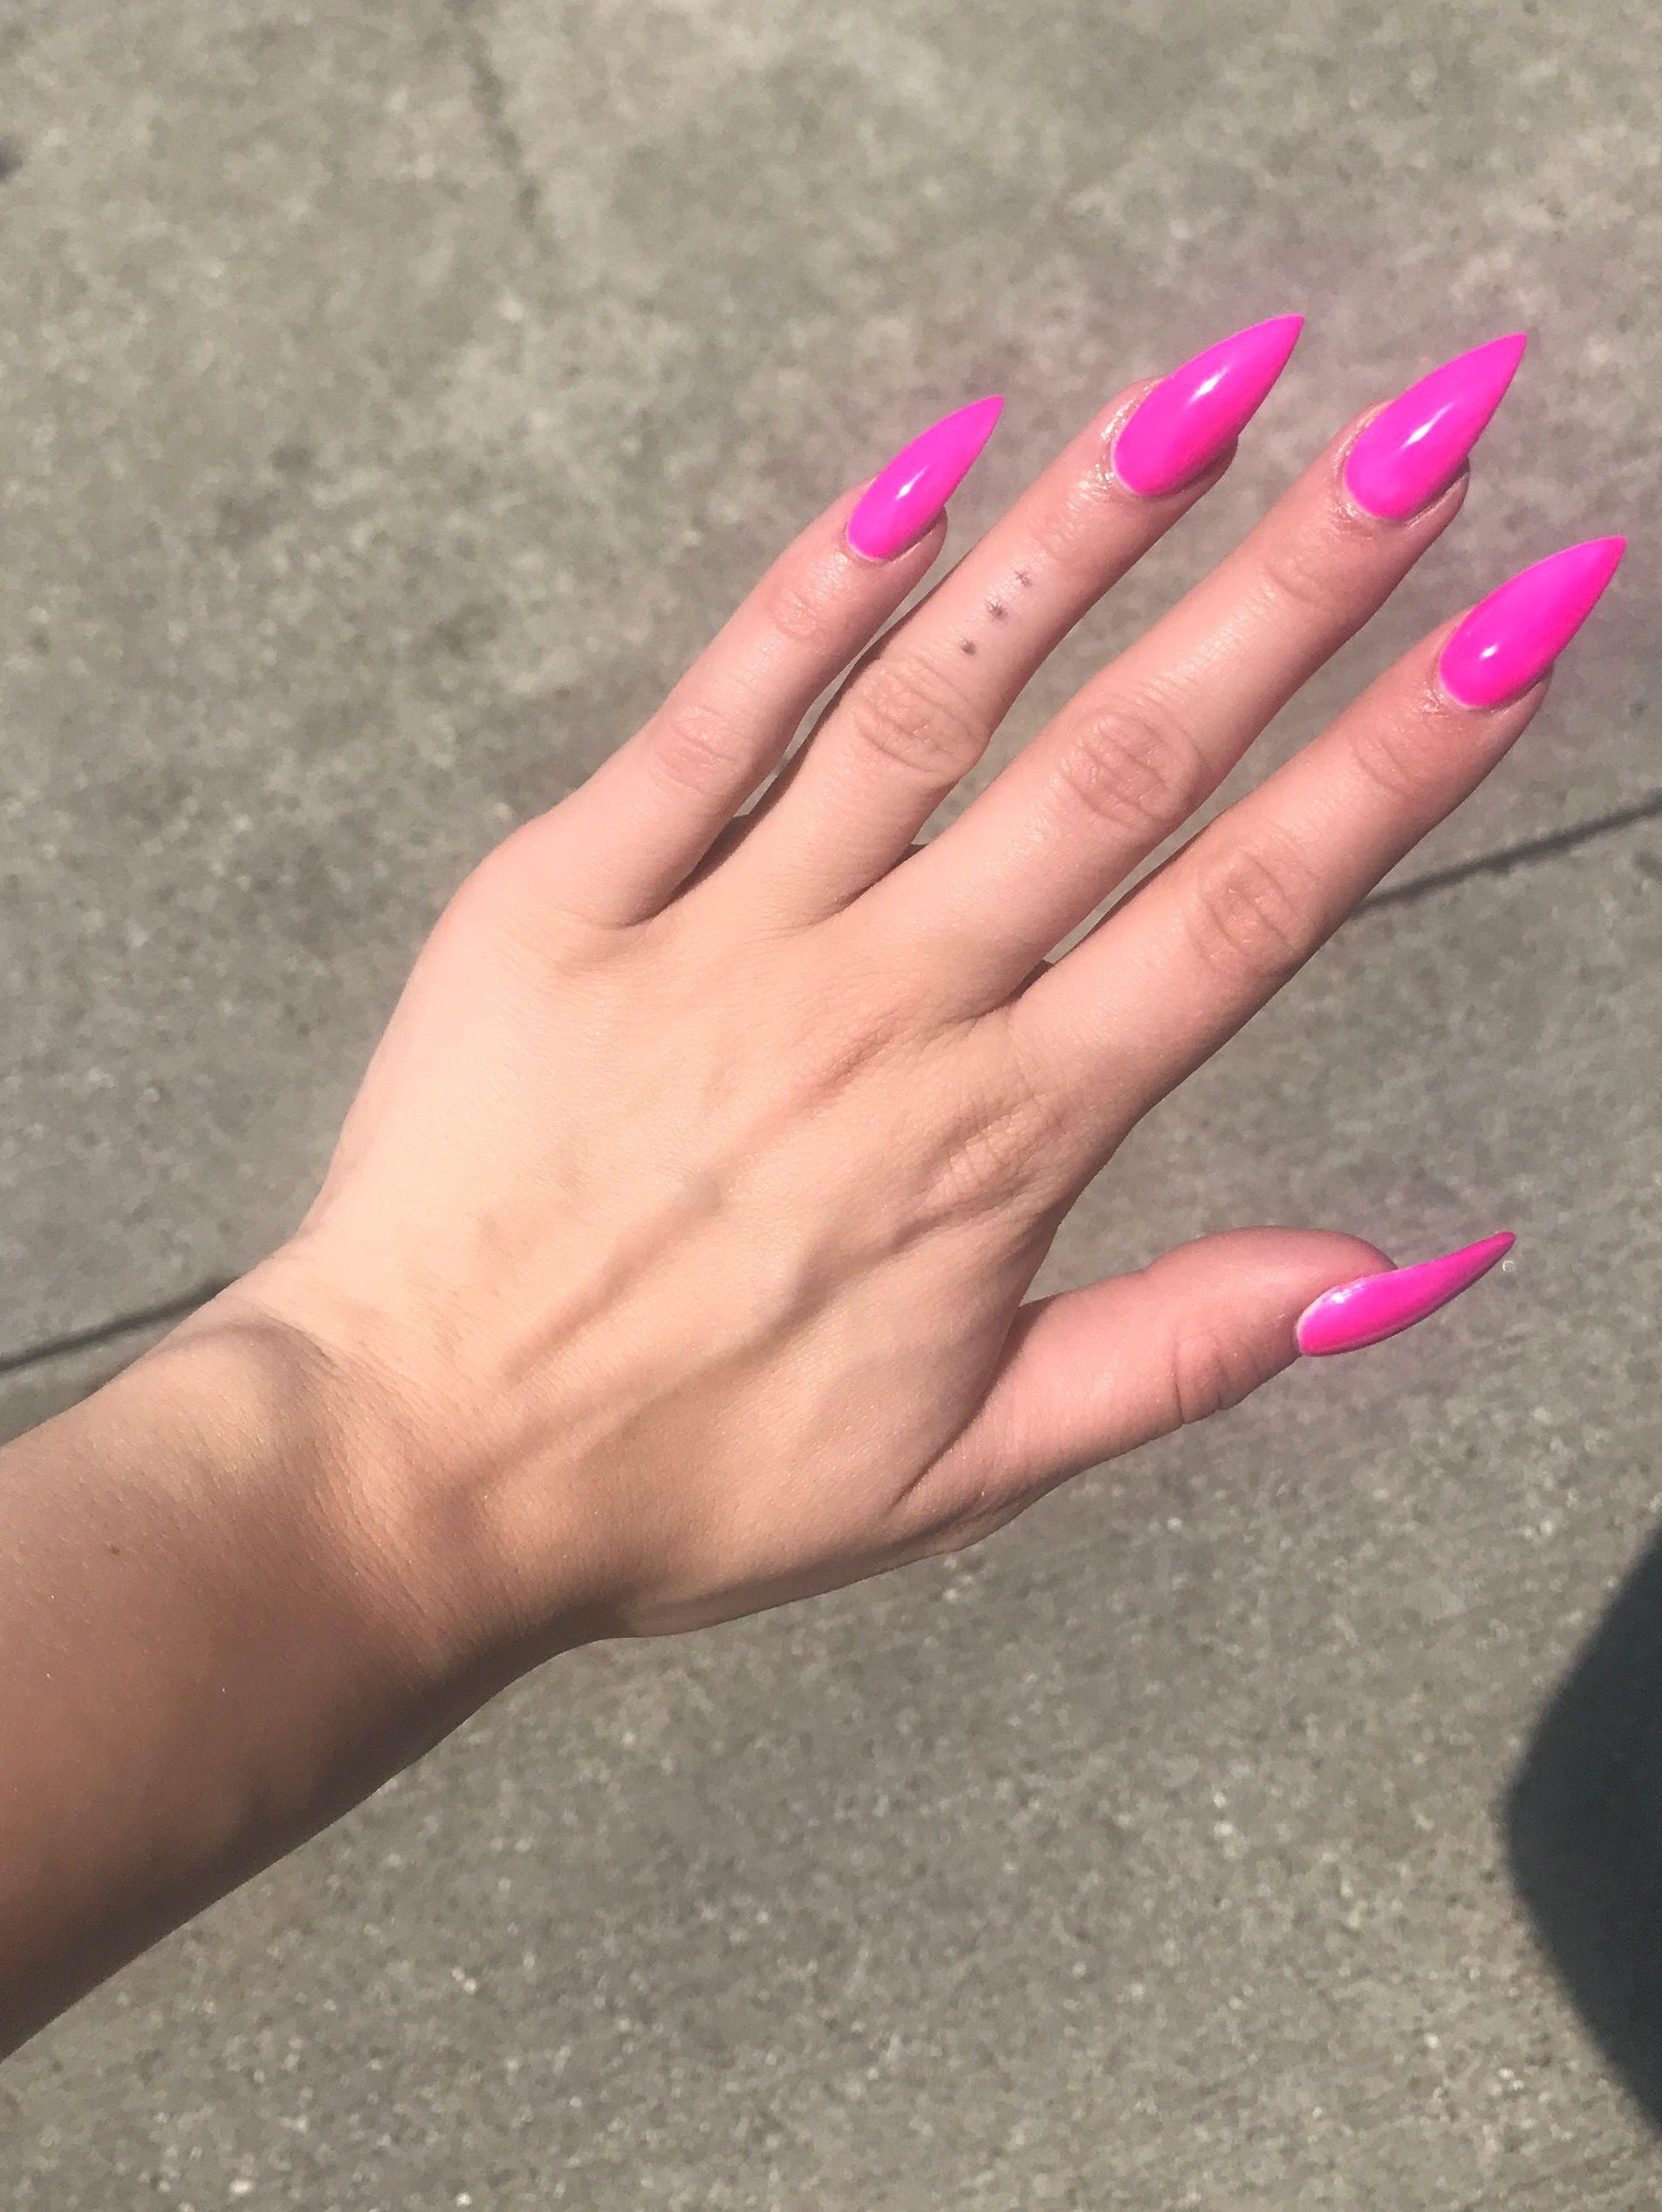 Barbie Pink Stiletto Nails Xqueen0fheartsx Pink Stiletto Nails Barbie Pink Nails Pink Nails